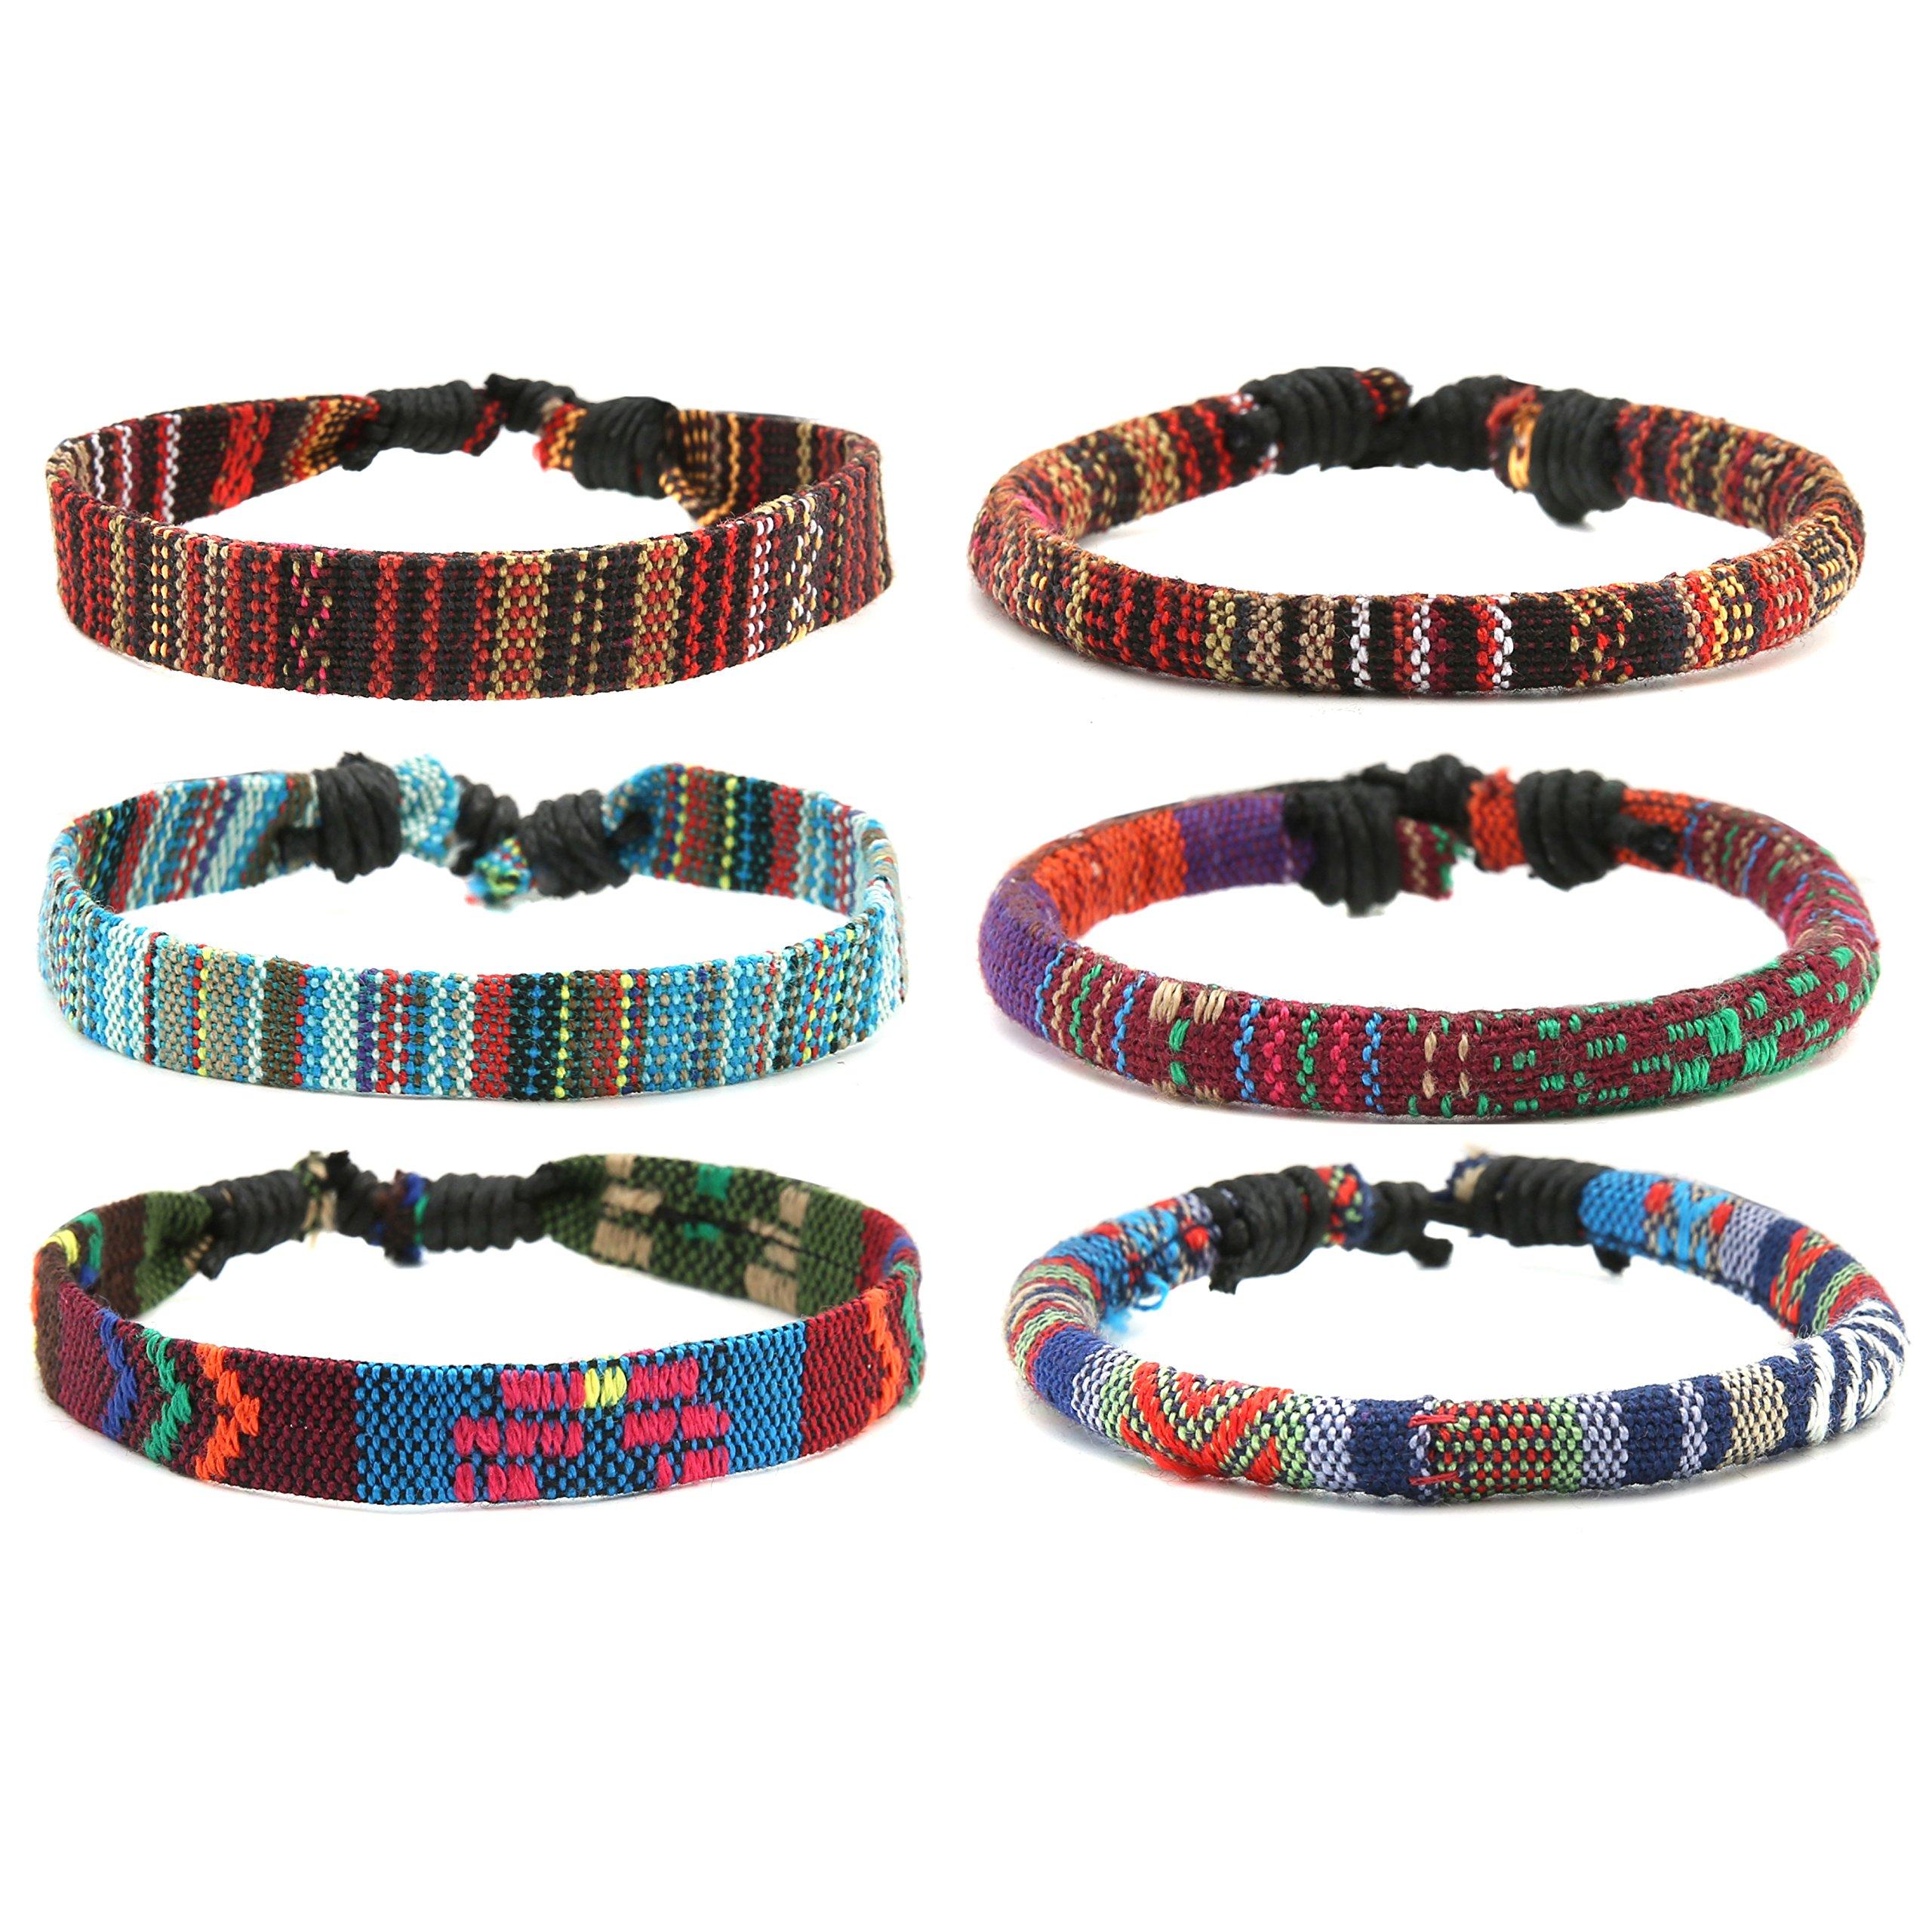 HZMAN Mix 6 Wrap Bracelets Men Women, Hemp Cords Ethnic Tribal Bracelets Wristbands (Mix 6 Wrap)